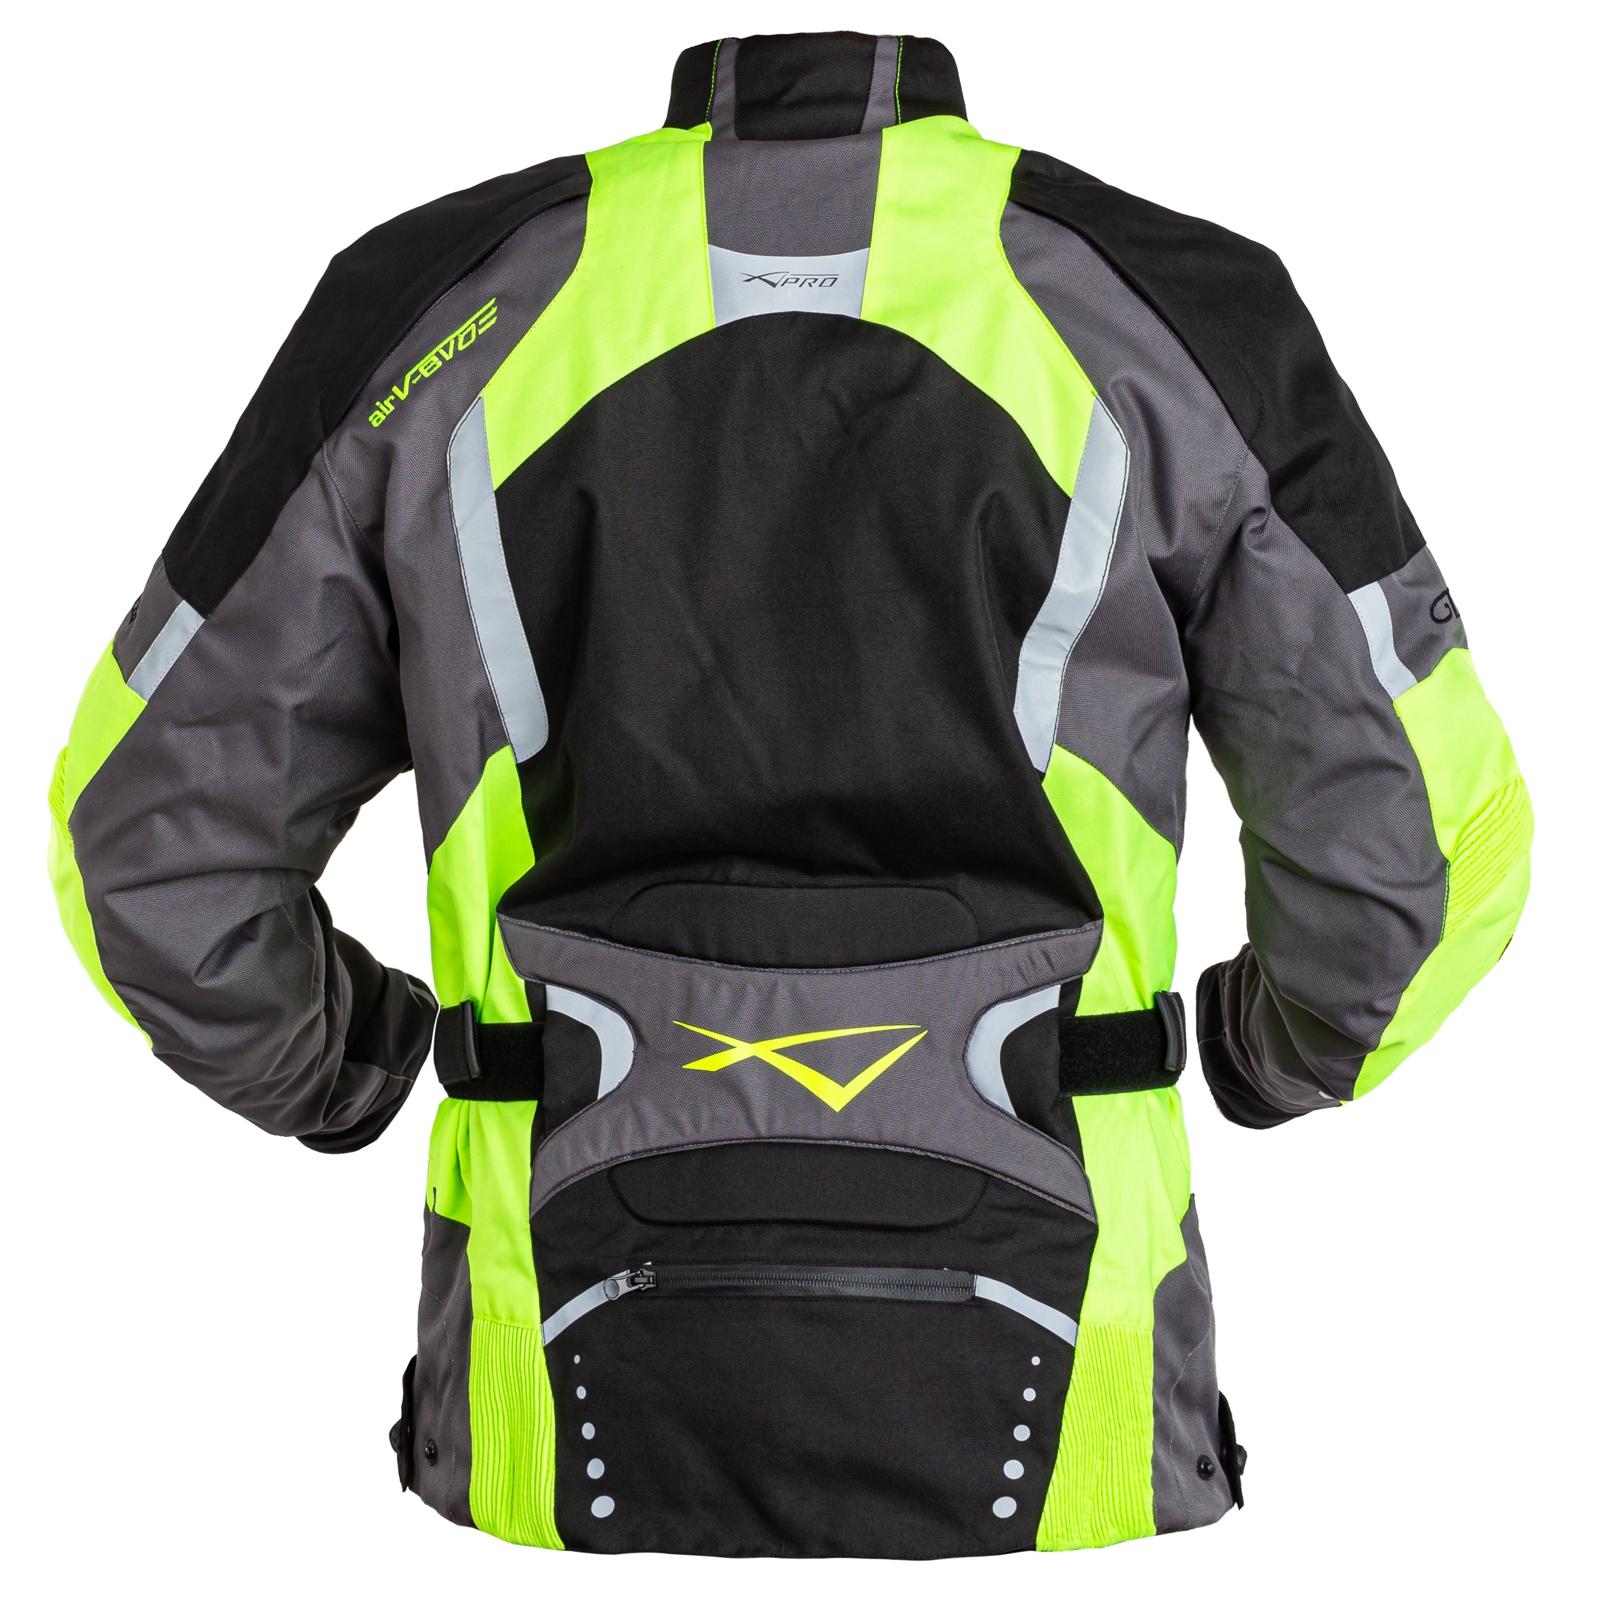 miniatuur 12 - Giacca Touring Moto Cordura Tessuto Protezioni CE Sfoderabile Impermeabile